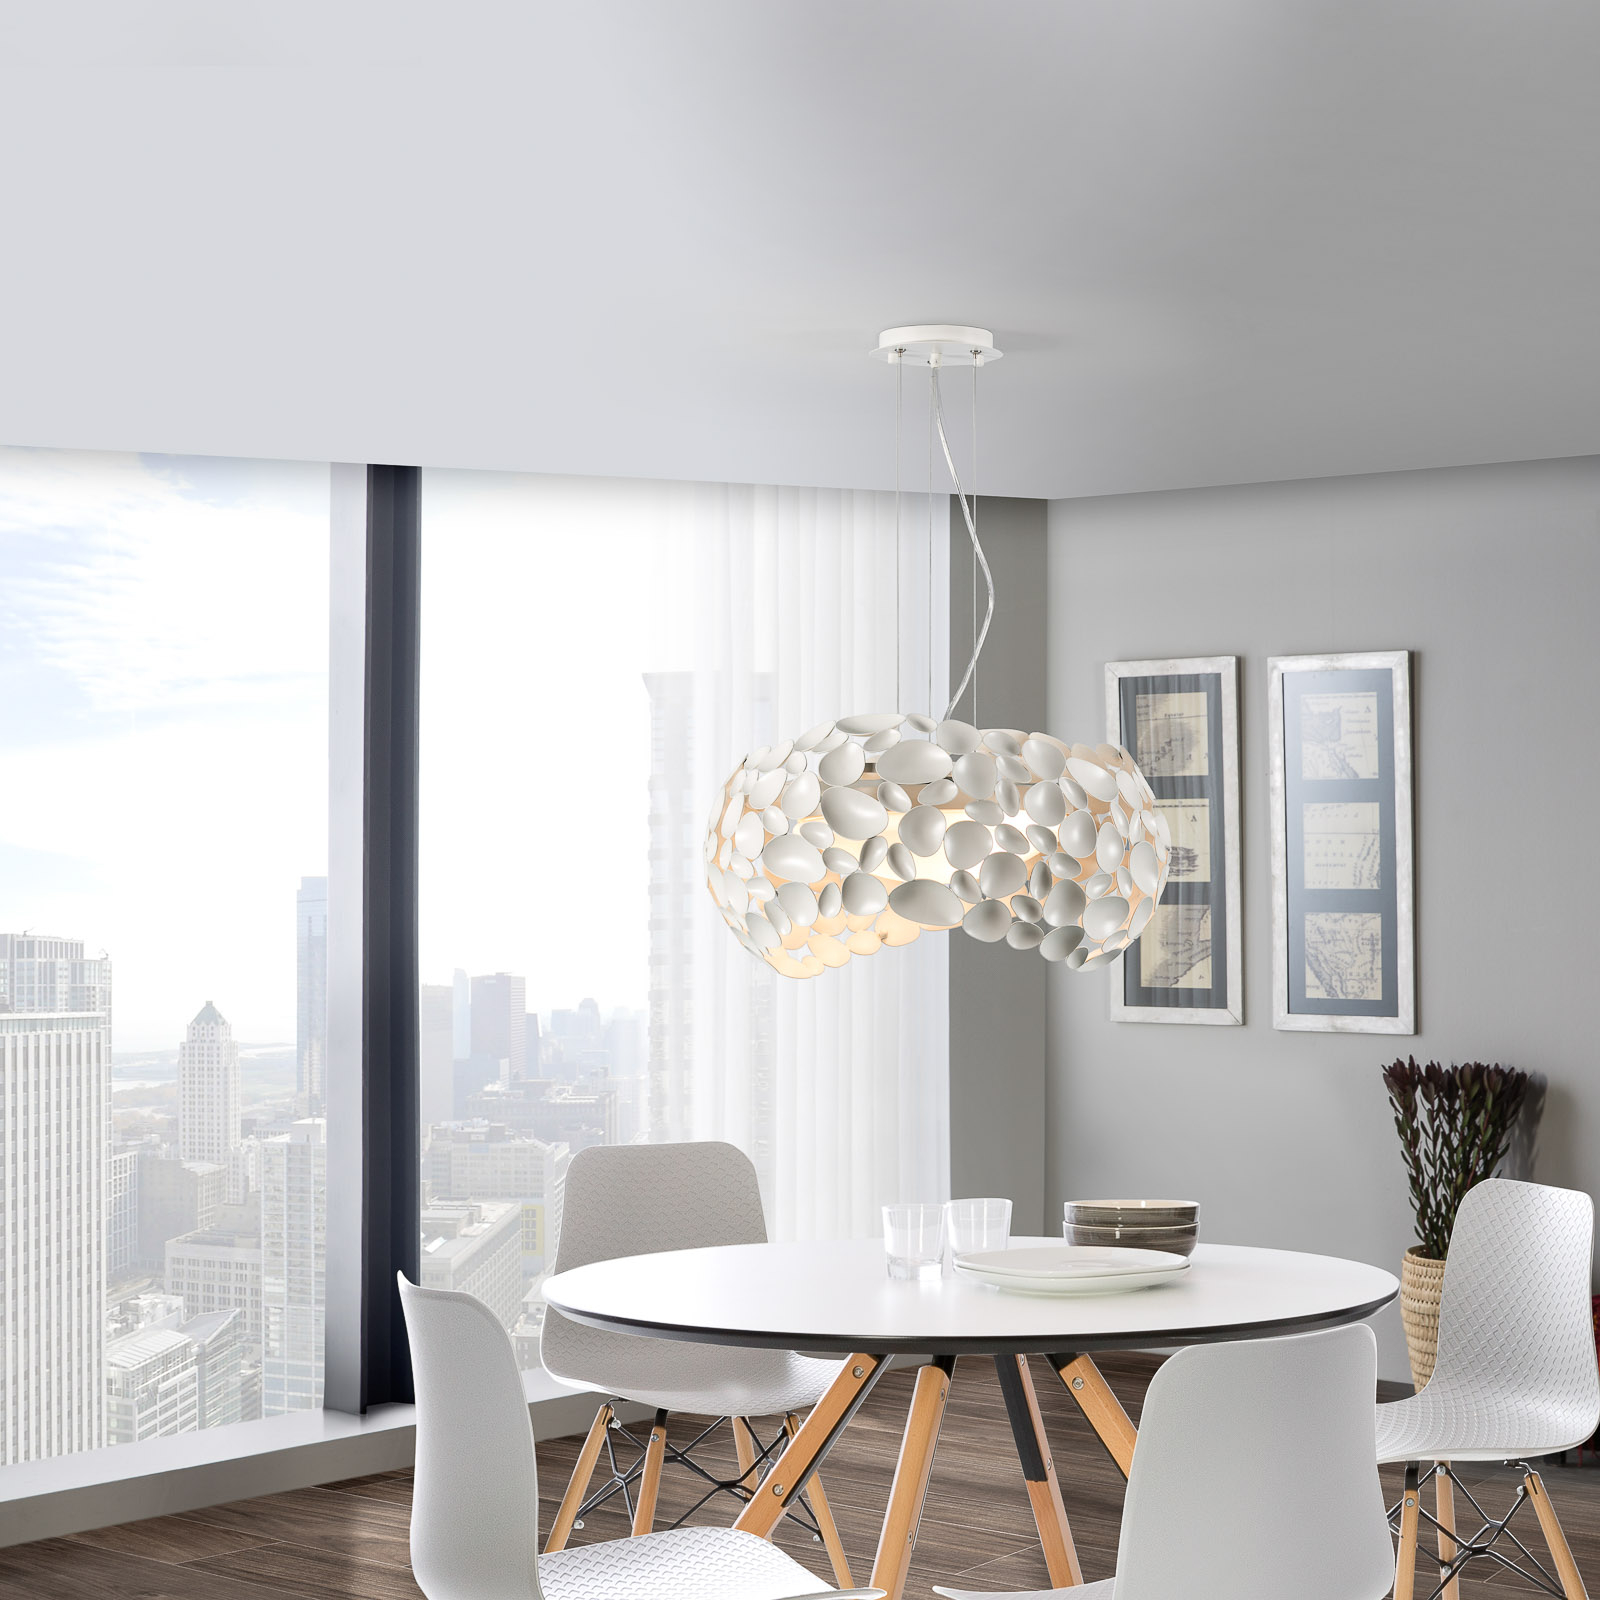 LED-Hängeleuchte Narisa 5xG9, Ø47cm, weiß